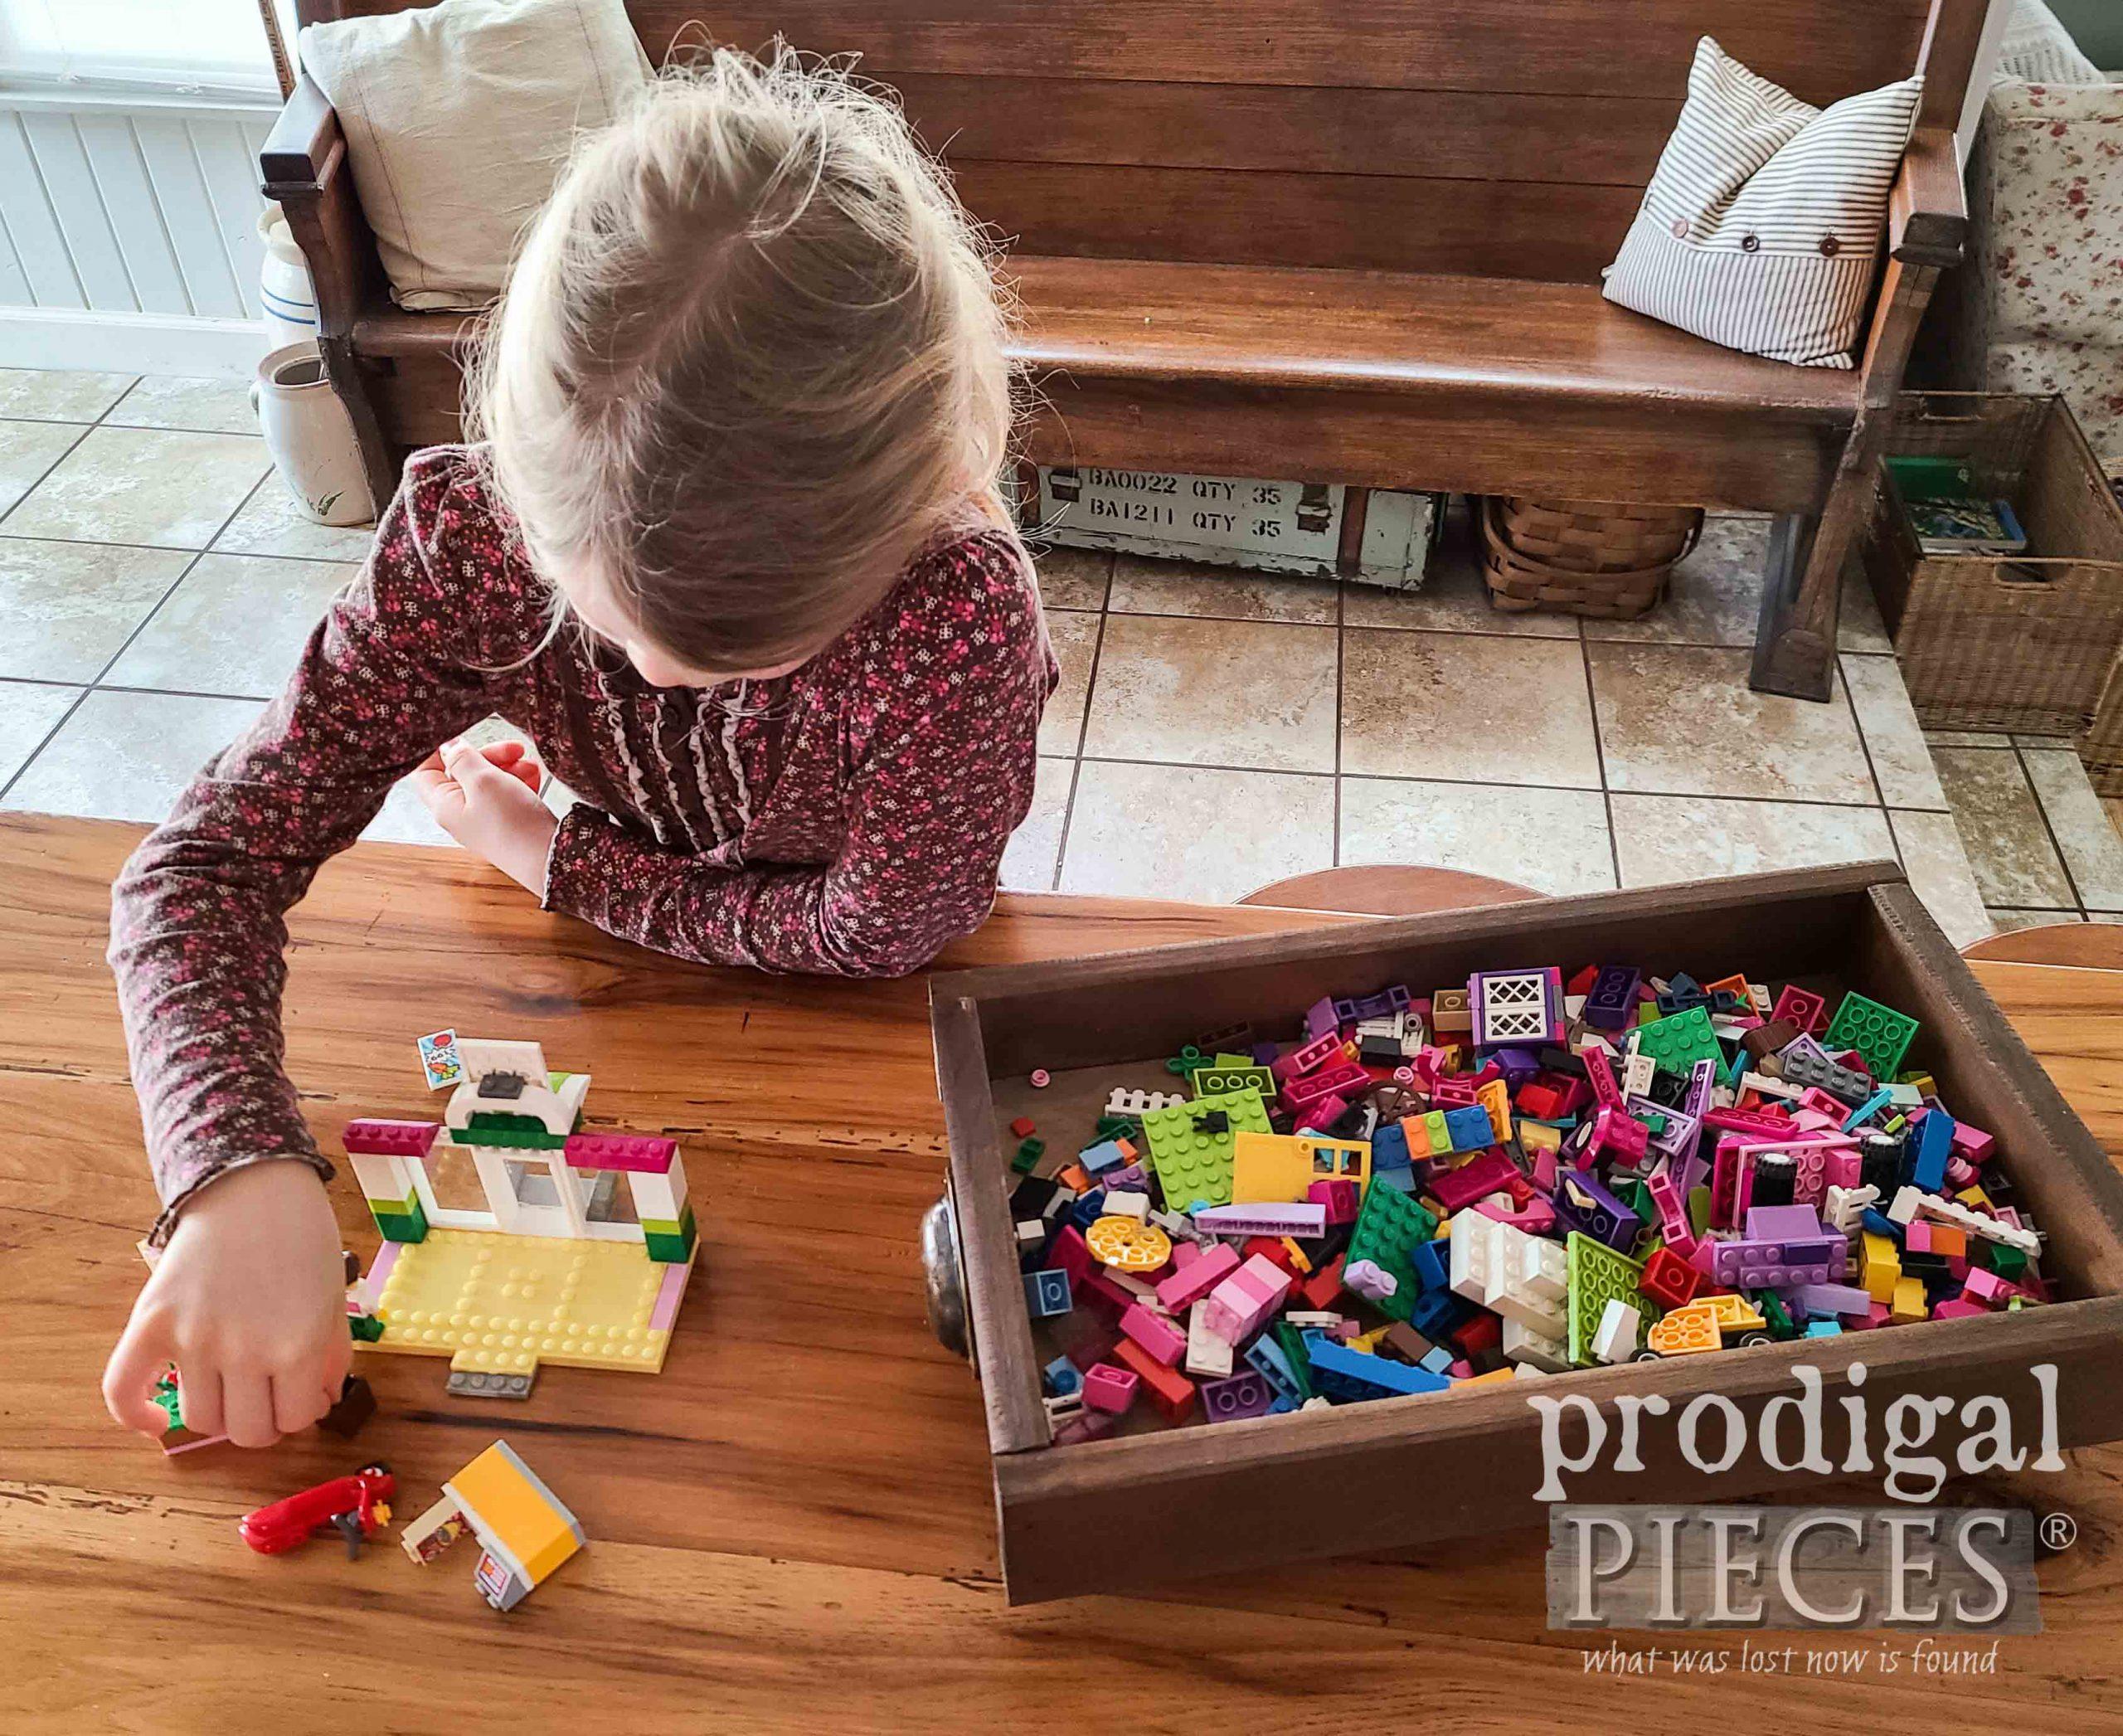 DIY Wood Slat Lego Tray for Storage by Larissa of Prodigal Pieces | prodigalpieces.com #prodigalpieces #handmade #home #lego #toys